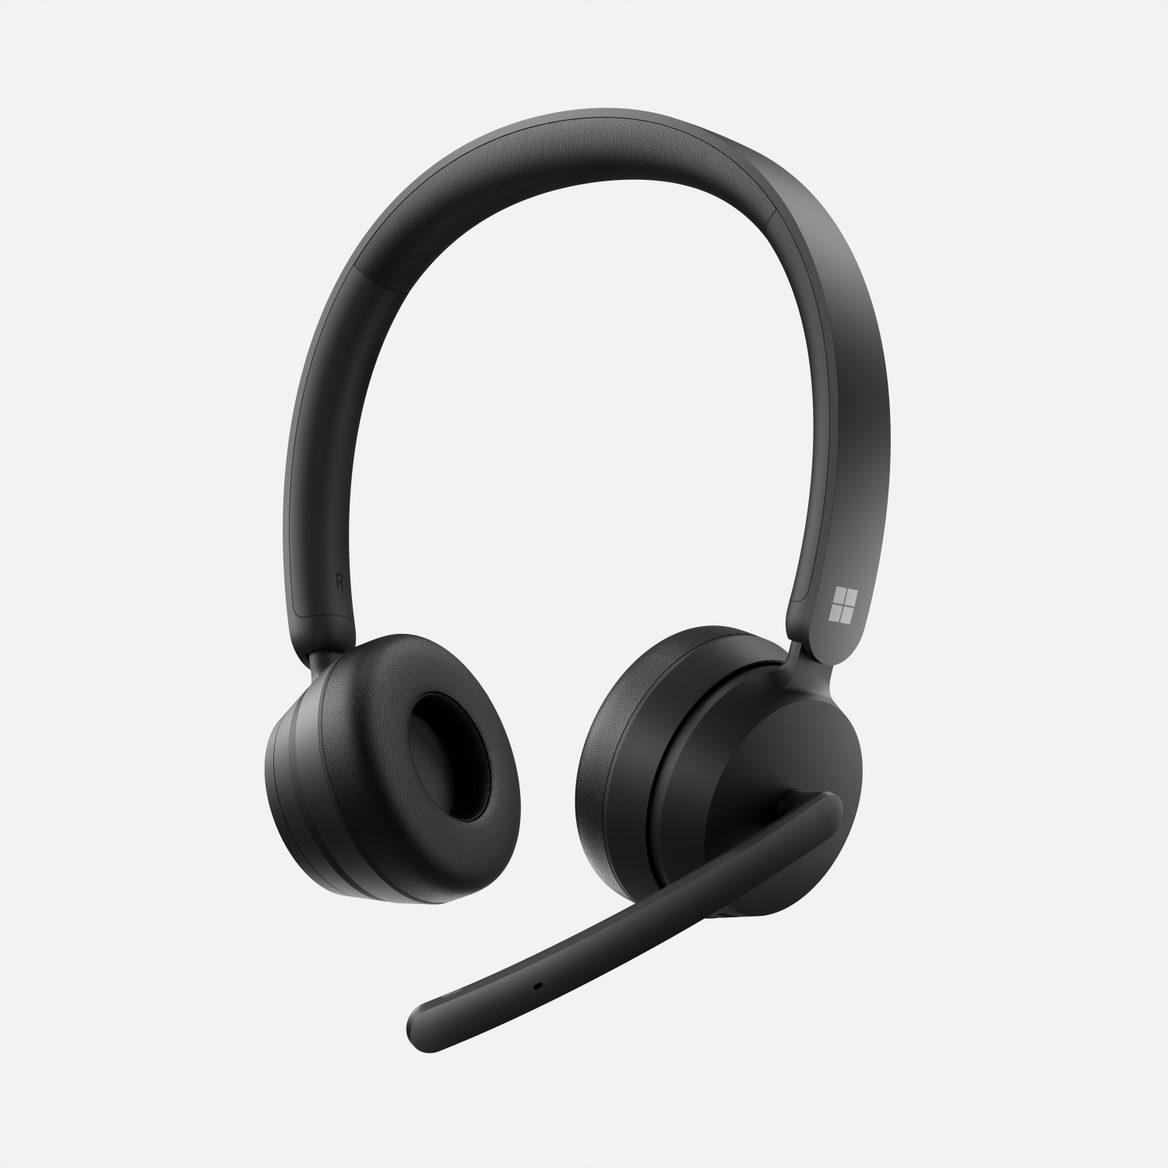 Microsoft Modern Wireless Headset for Business, Black - 8JS-00011